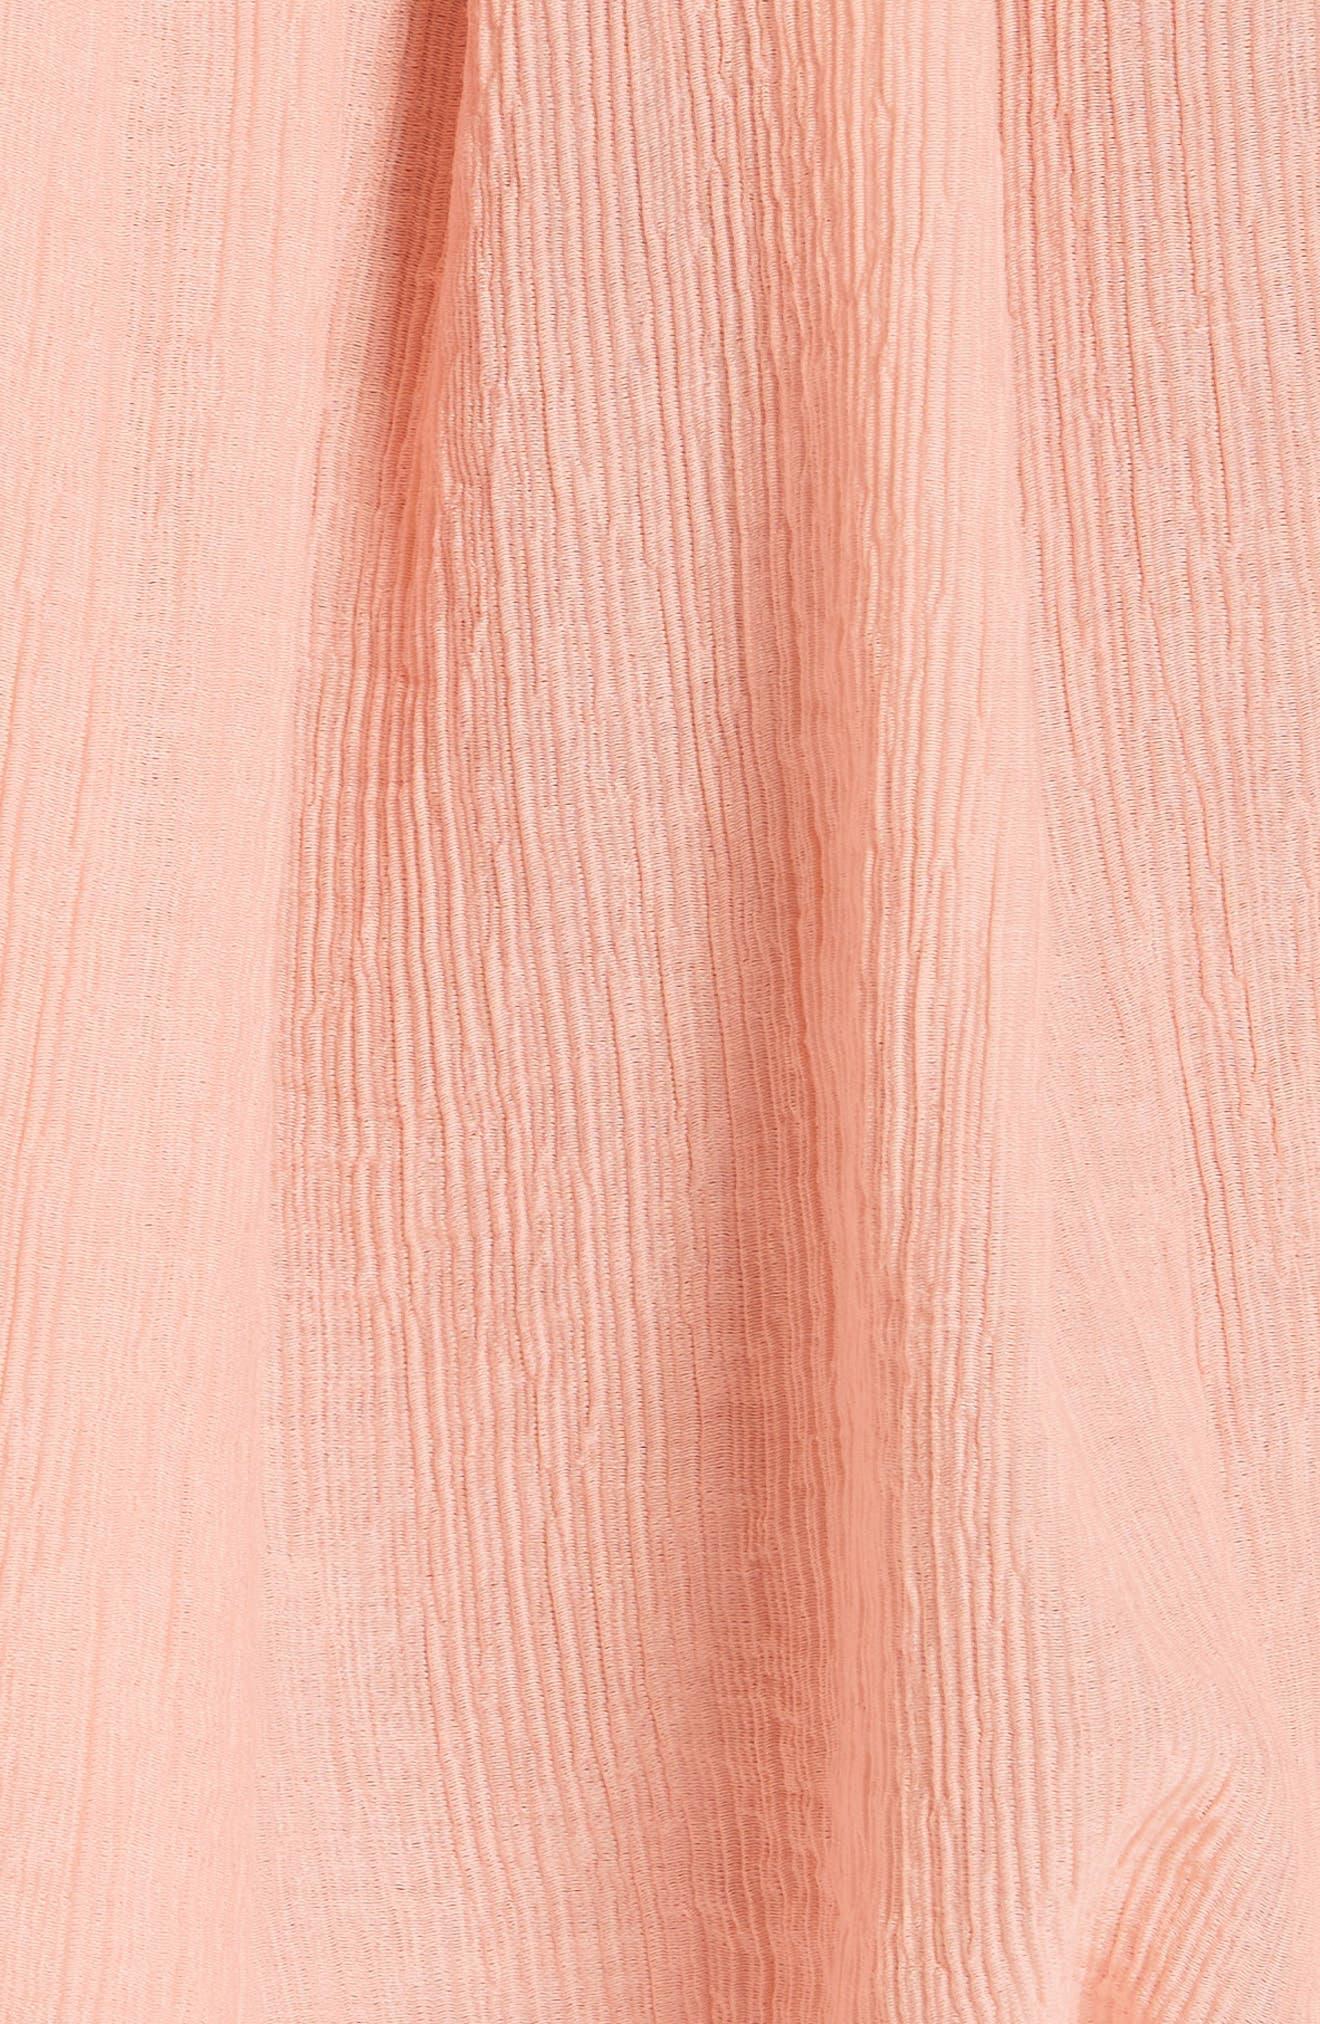 Elazara Ruched Sleeve Peasant Top,                             Alternate thumbnail 5, color,                             Summer Pink